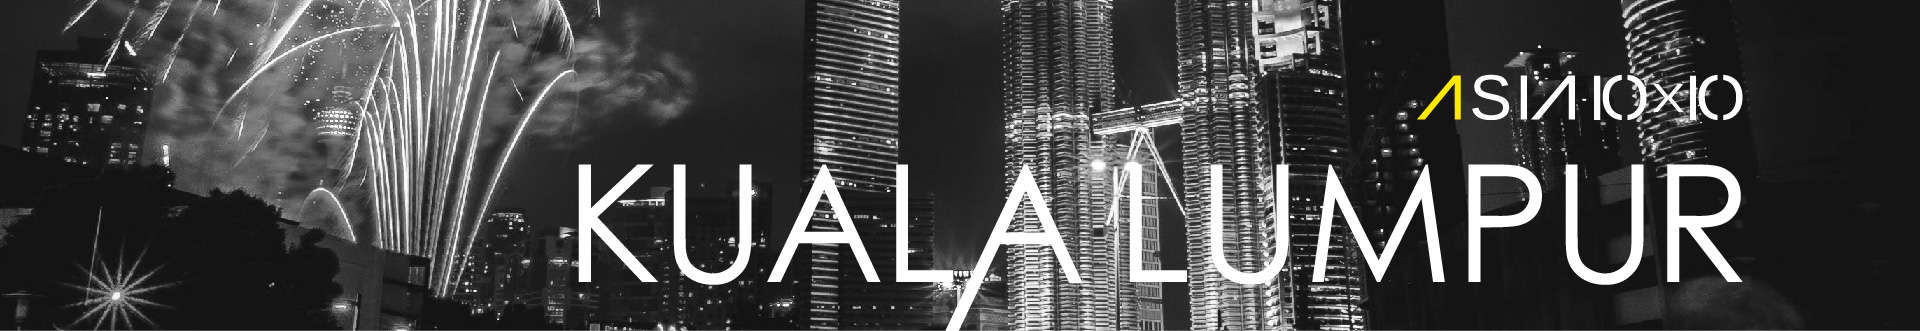 banner-asia1010-Kuala-Lumpur